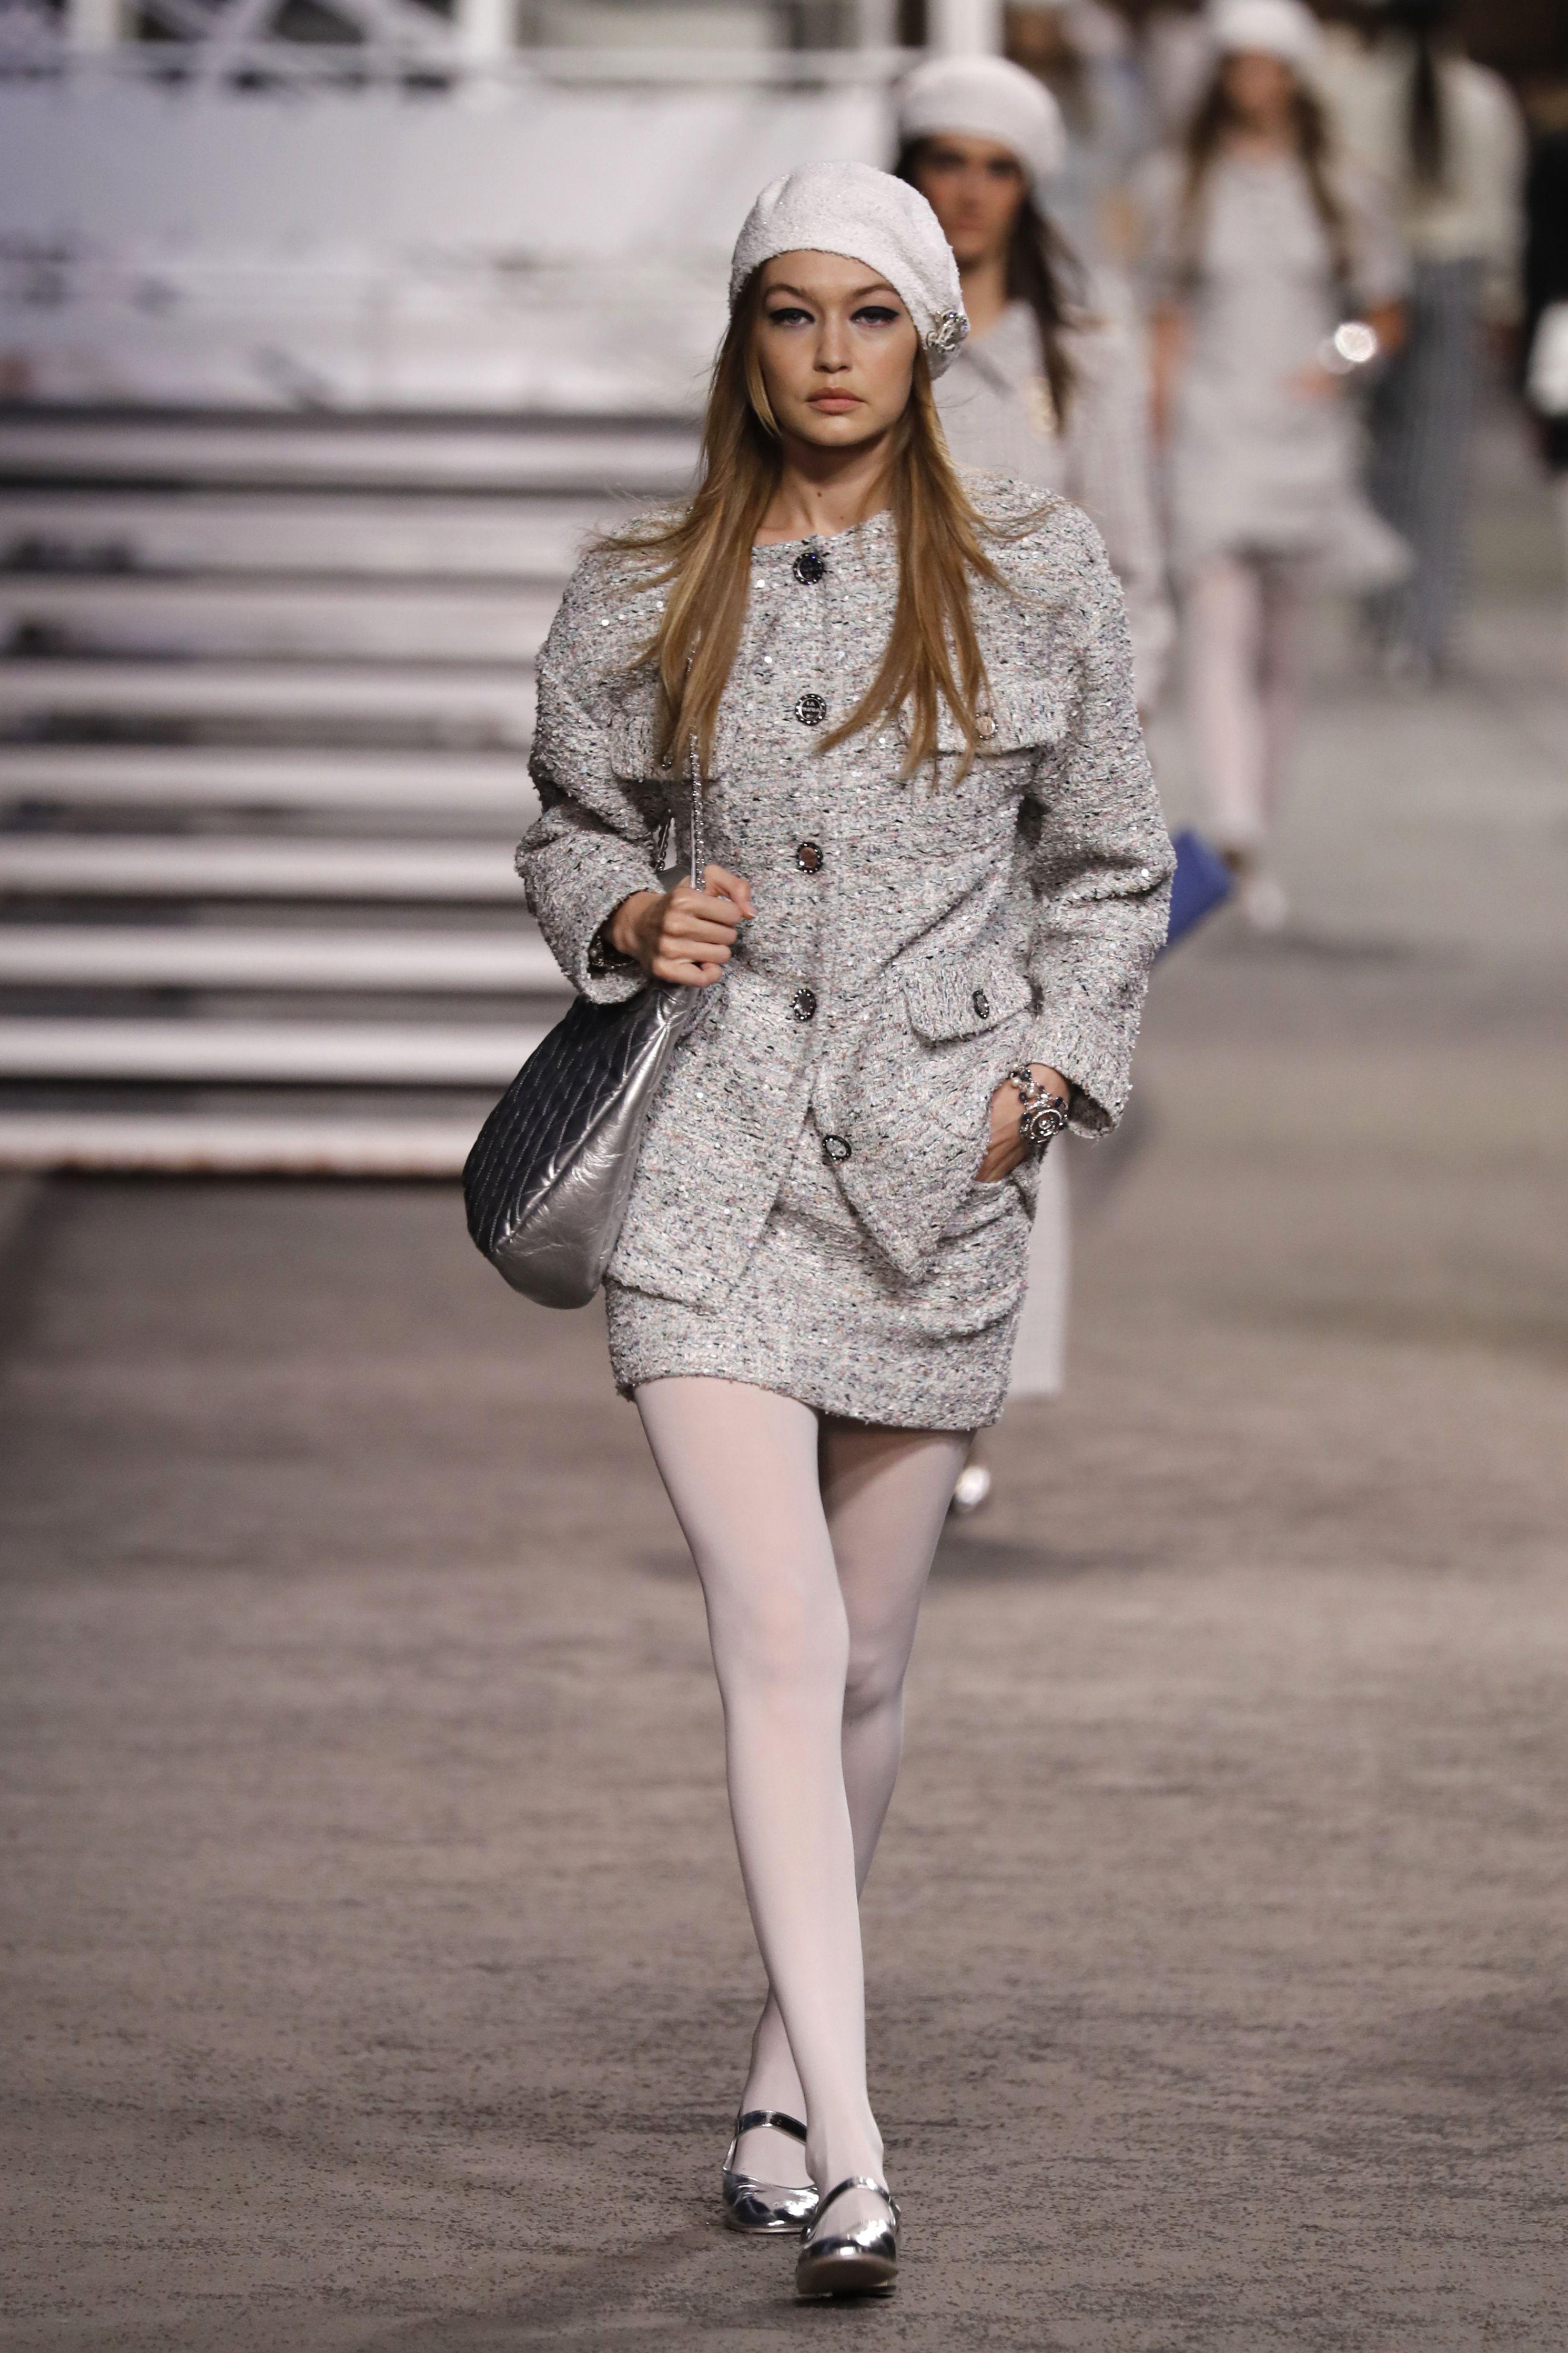 Gigi Hadid, Chanel, desfile, paris, cruise, barco